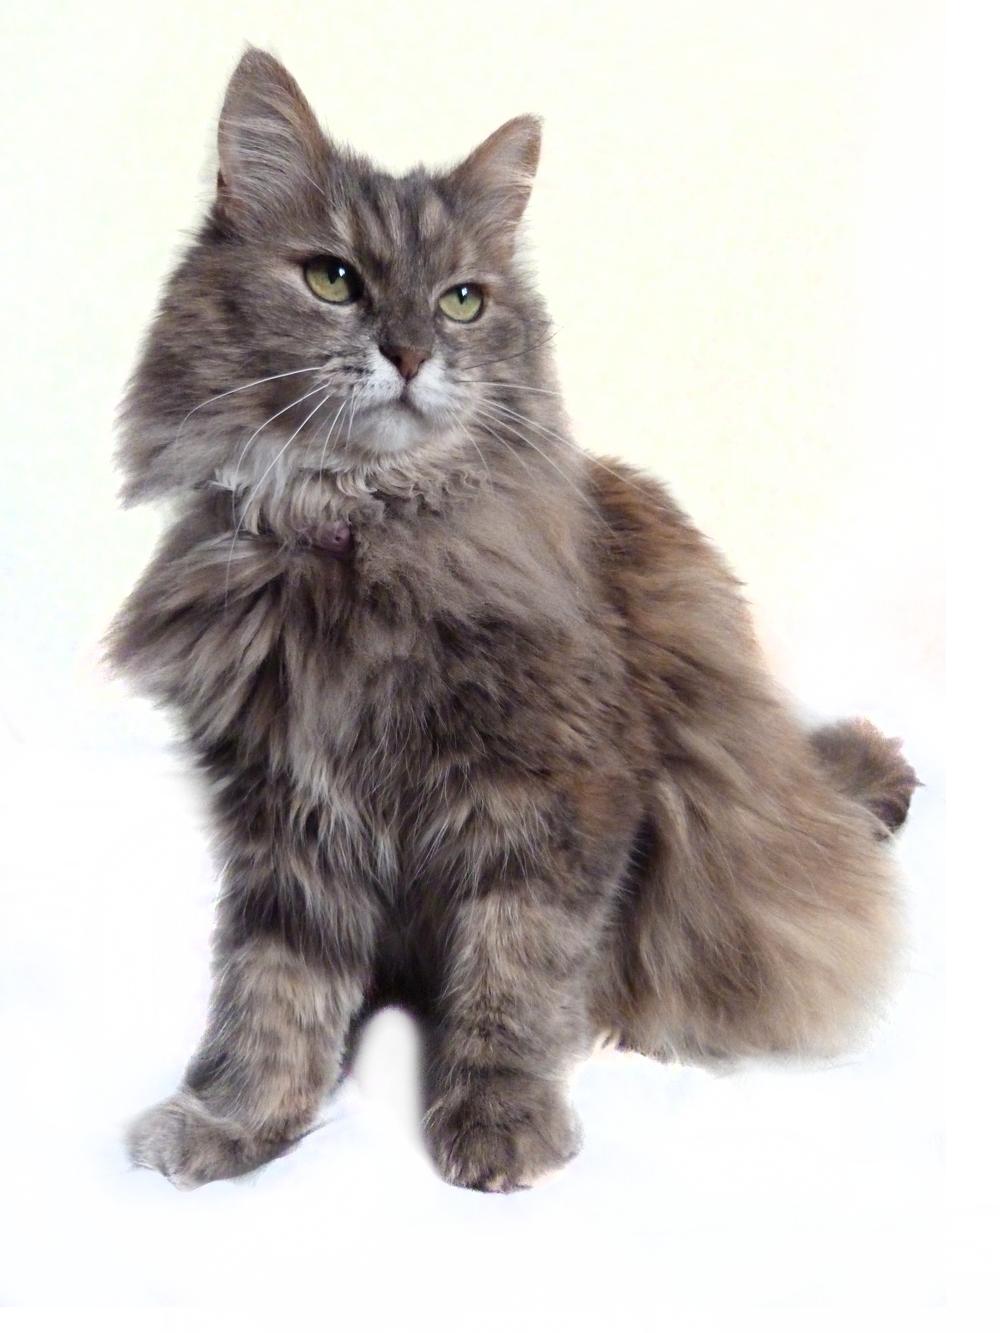 Mystic Cat Video Removed